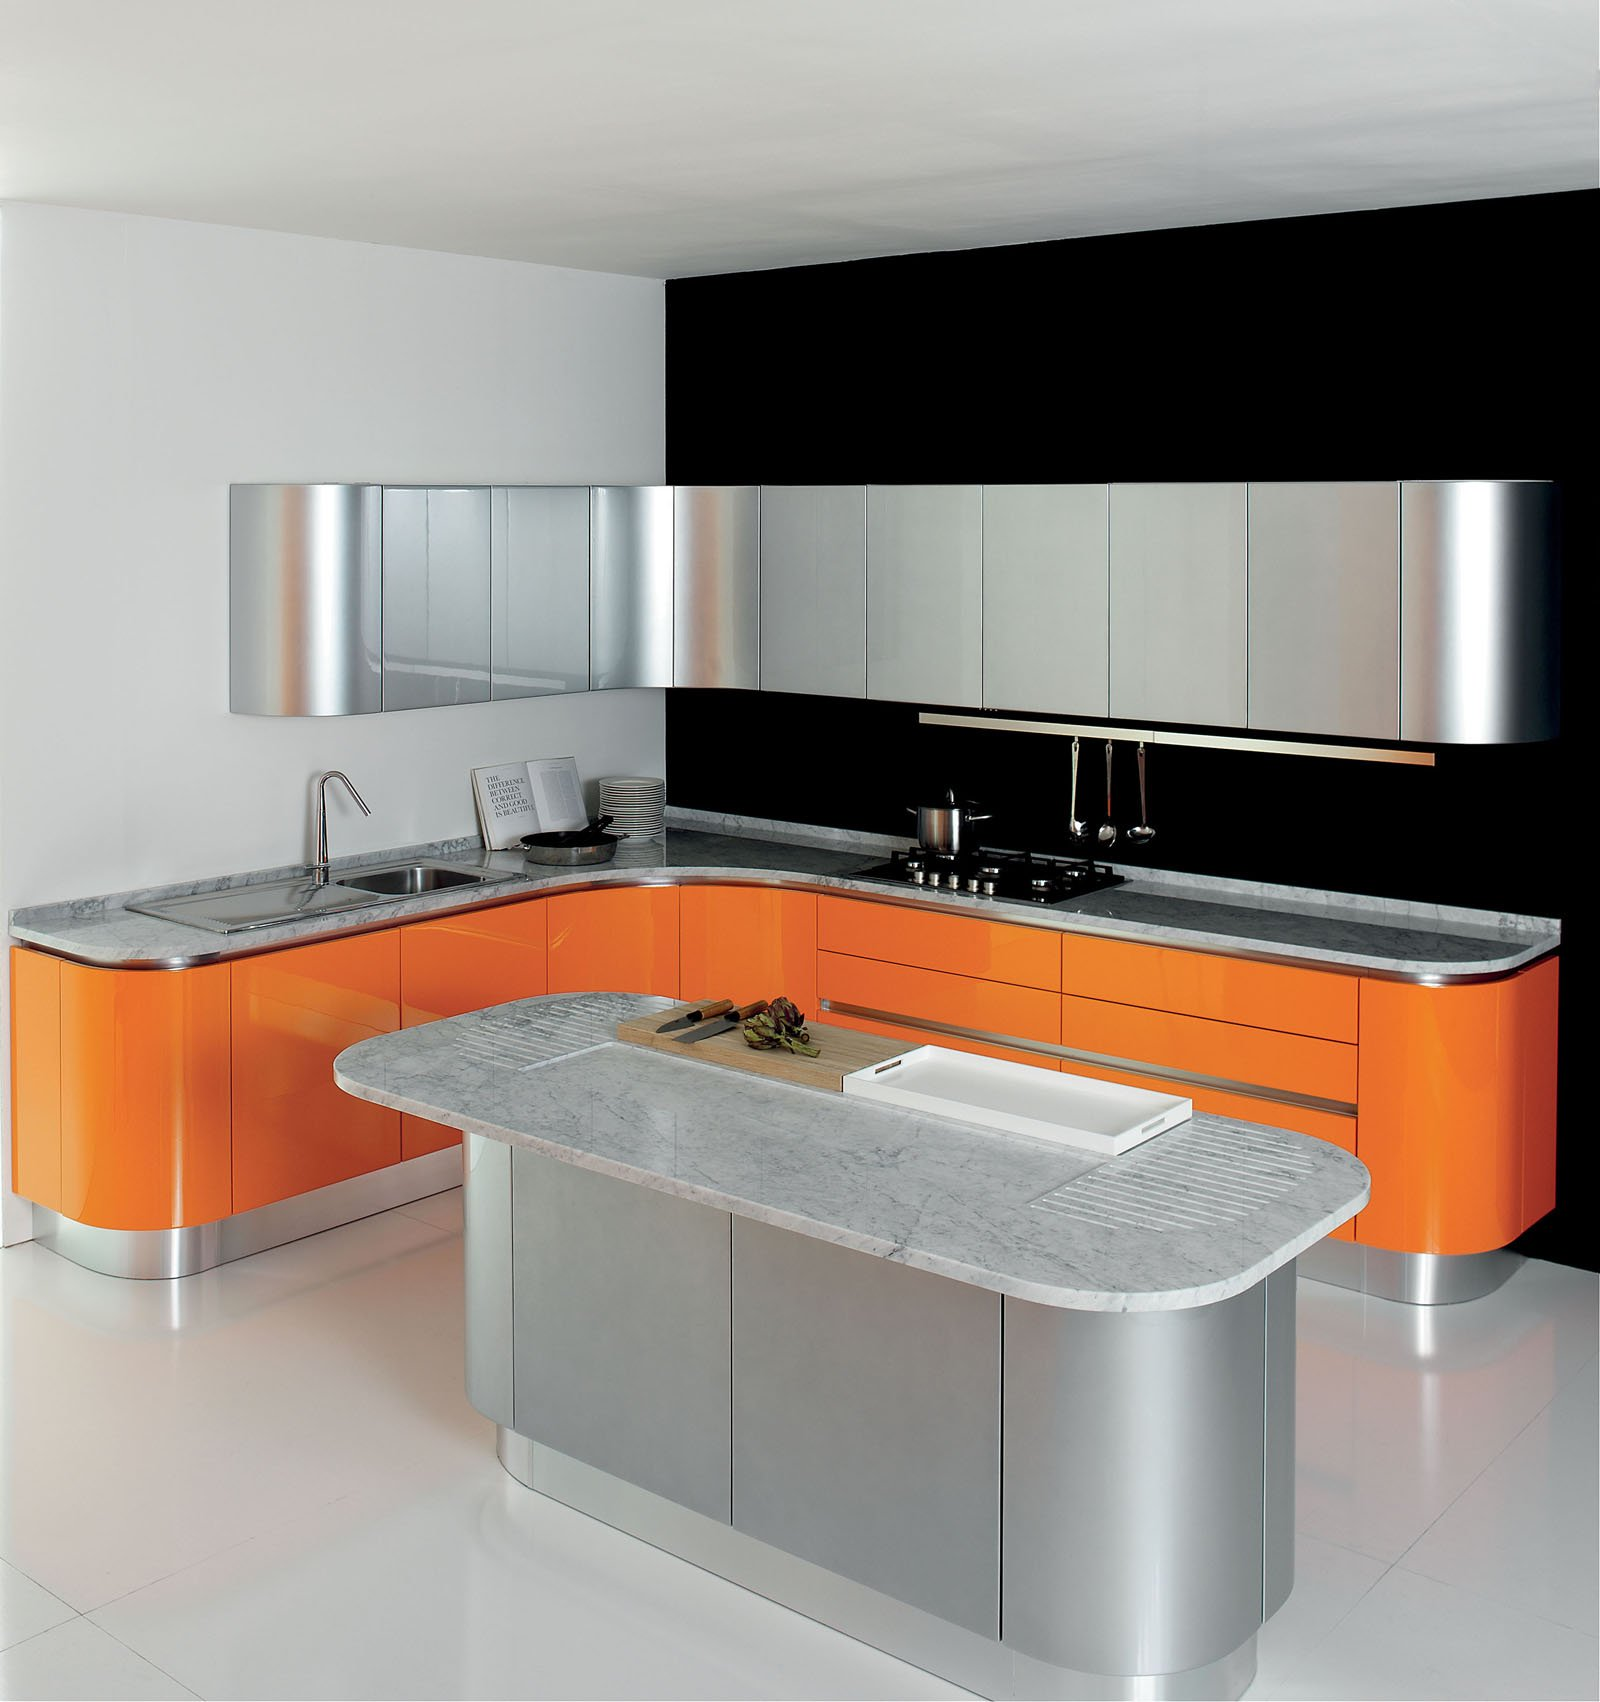 Aran 5 cucine per sfruttare lo spazio in modi differenti cose di casa - Cucine moderne colorate ...